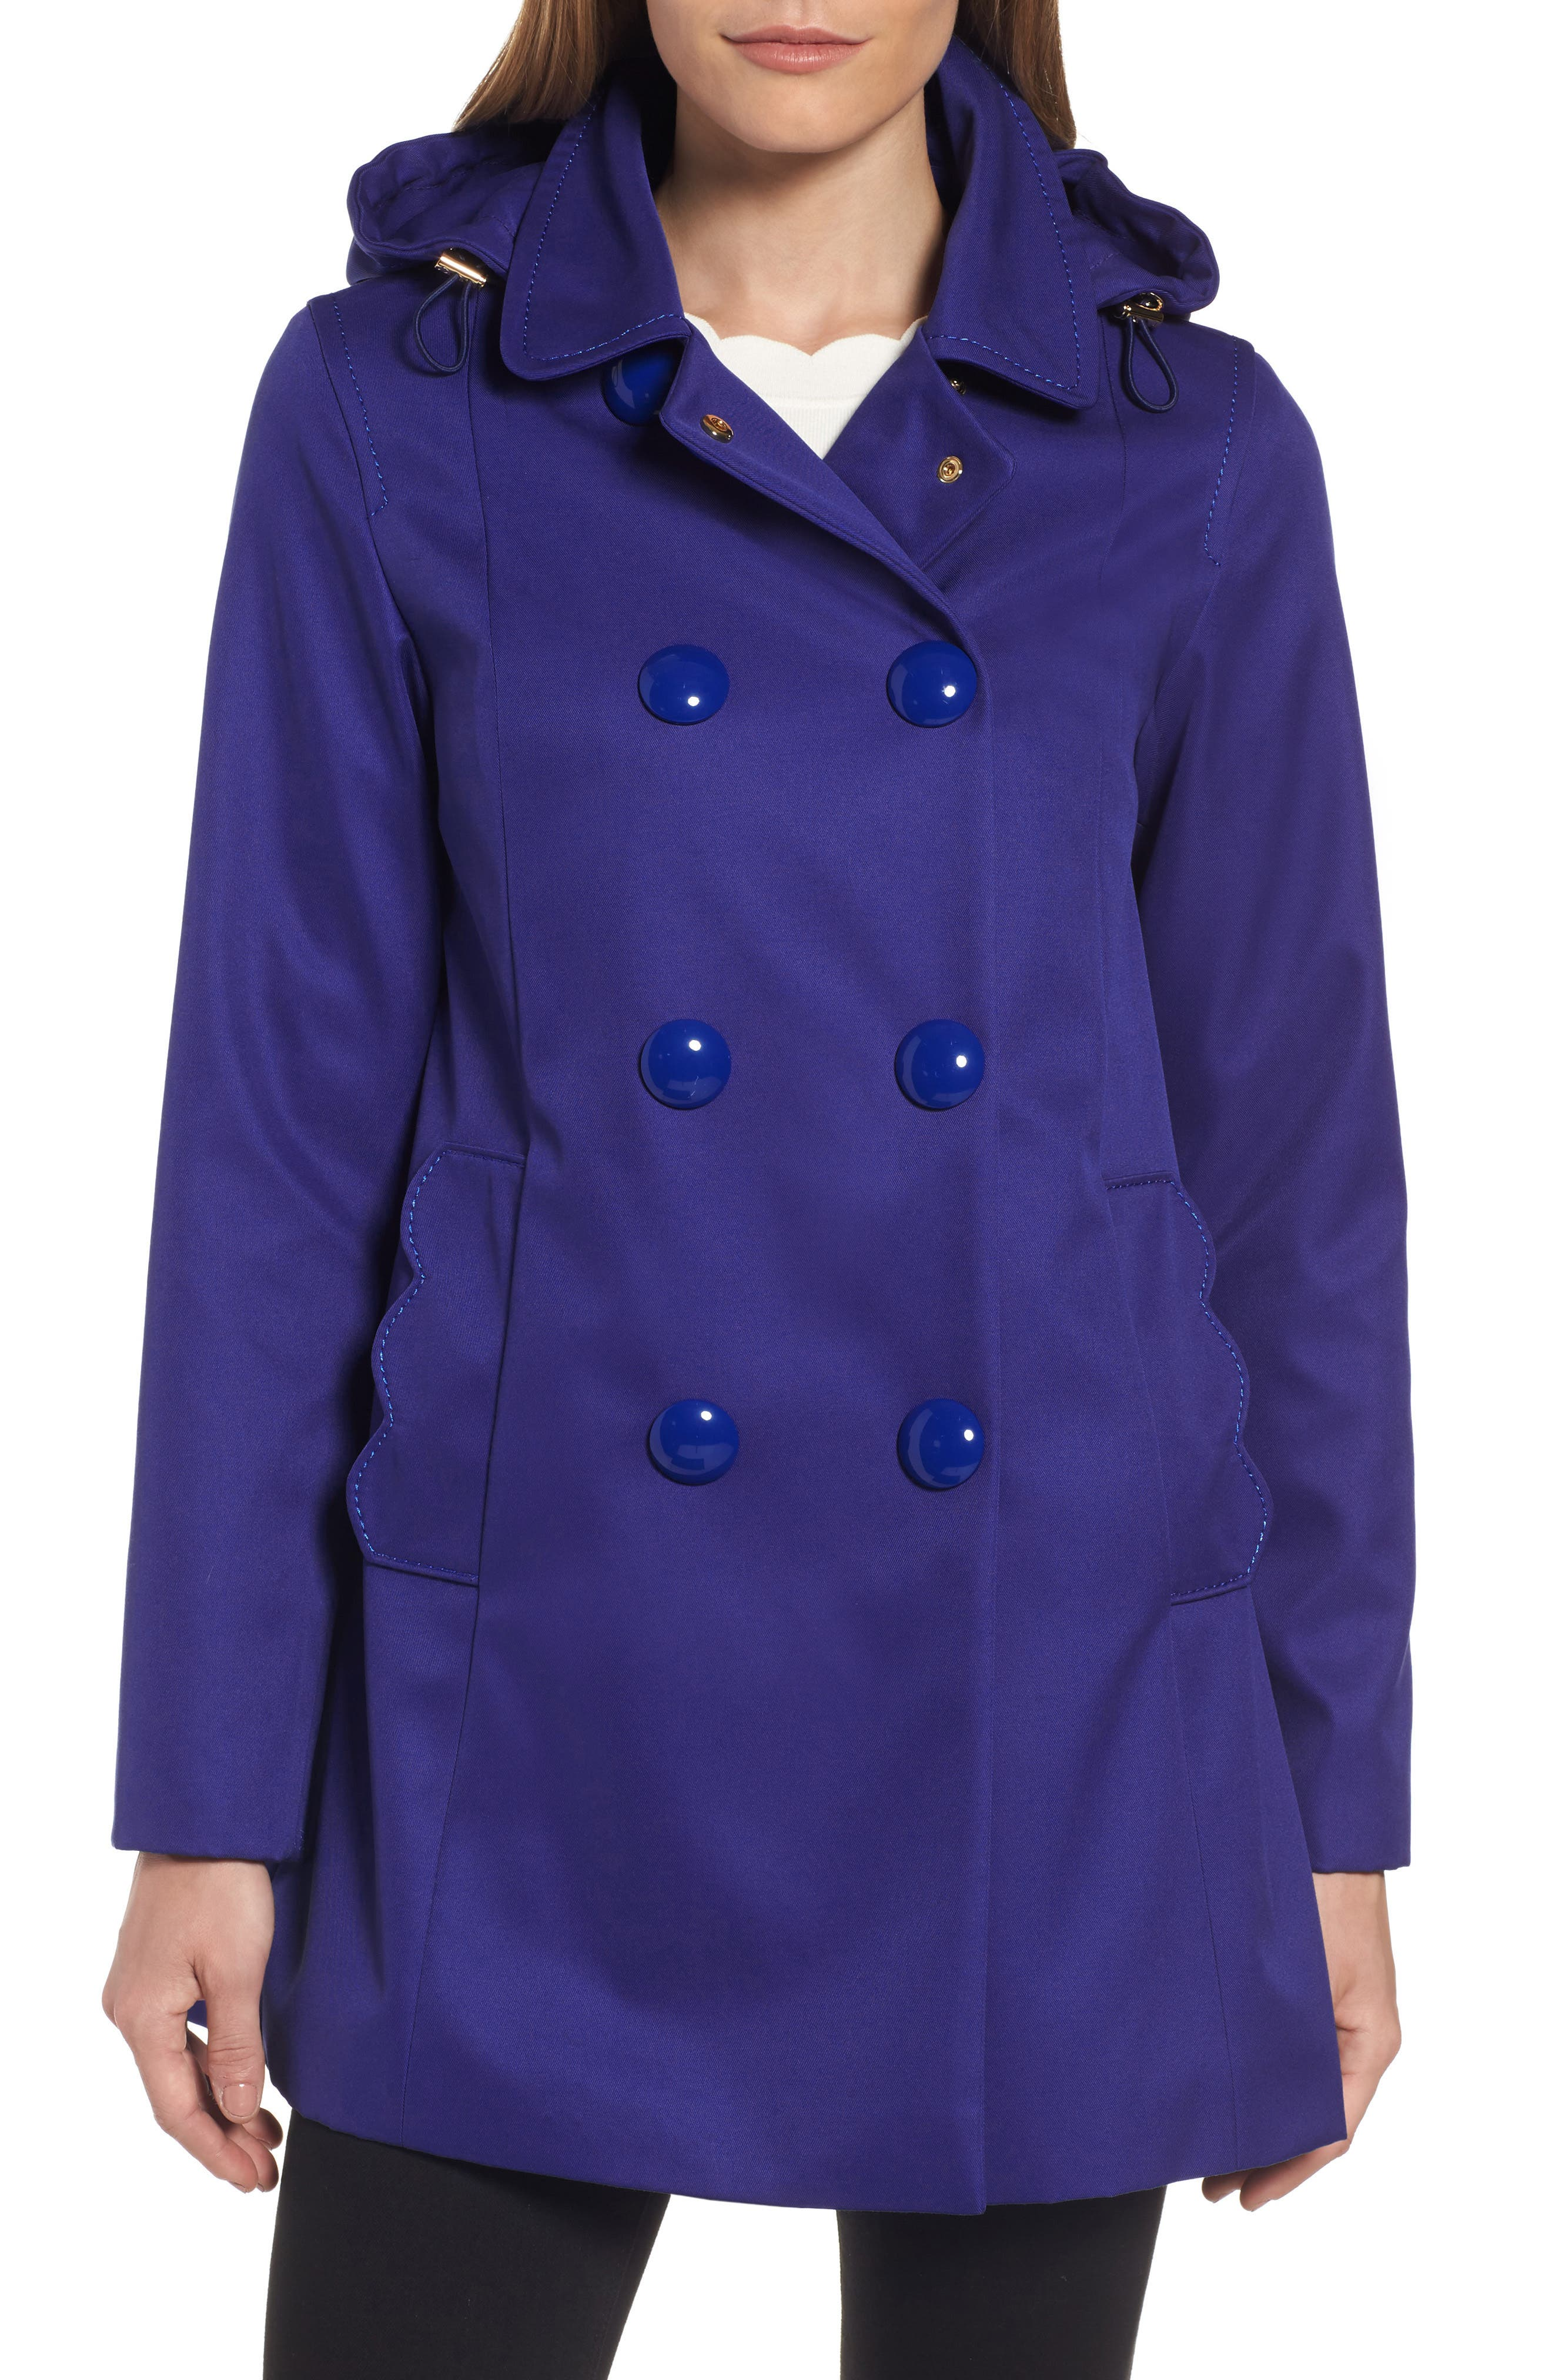 kate spade new york scallop pocket a-line raincoat (regular & petite)